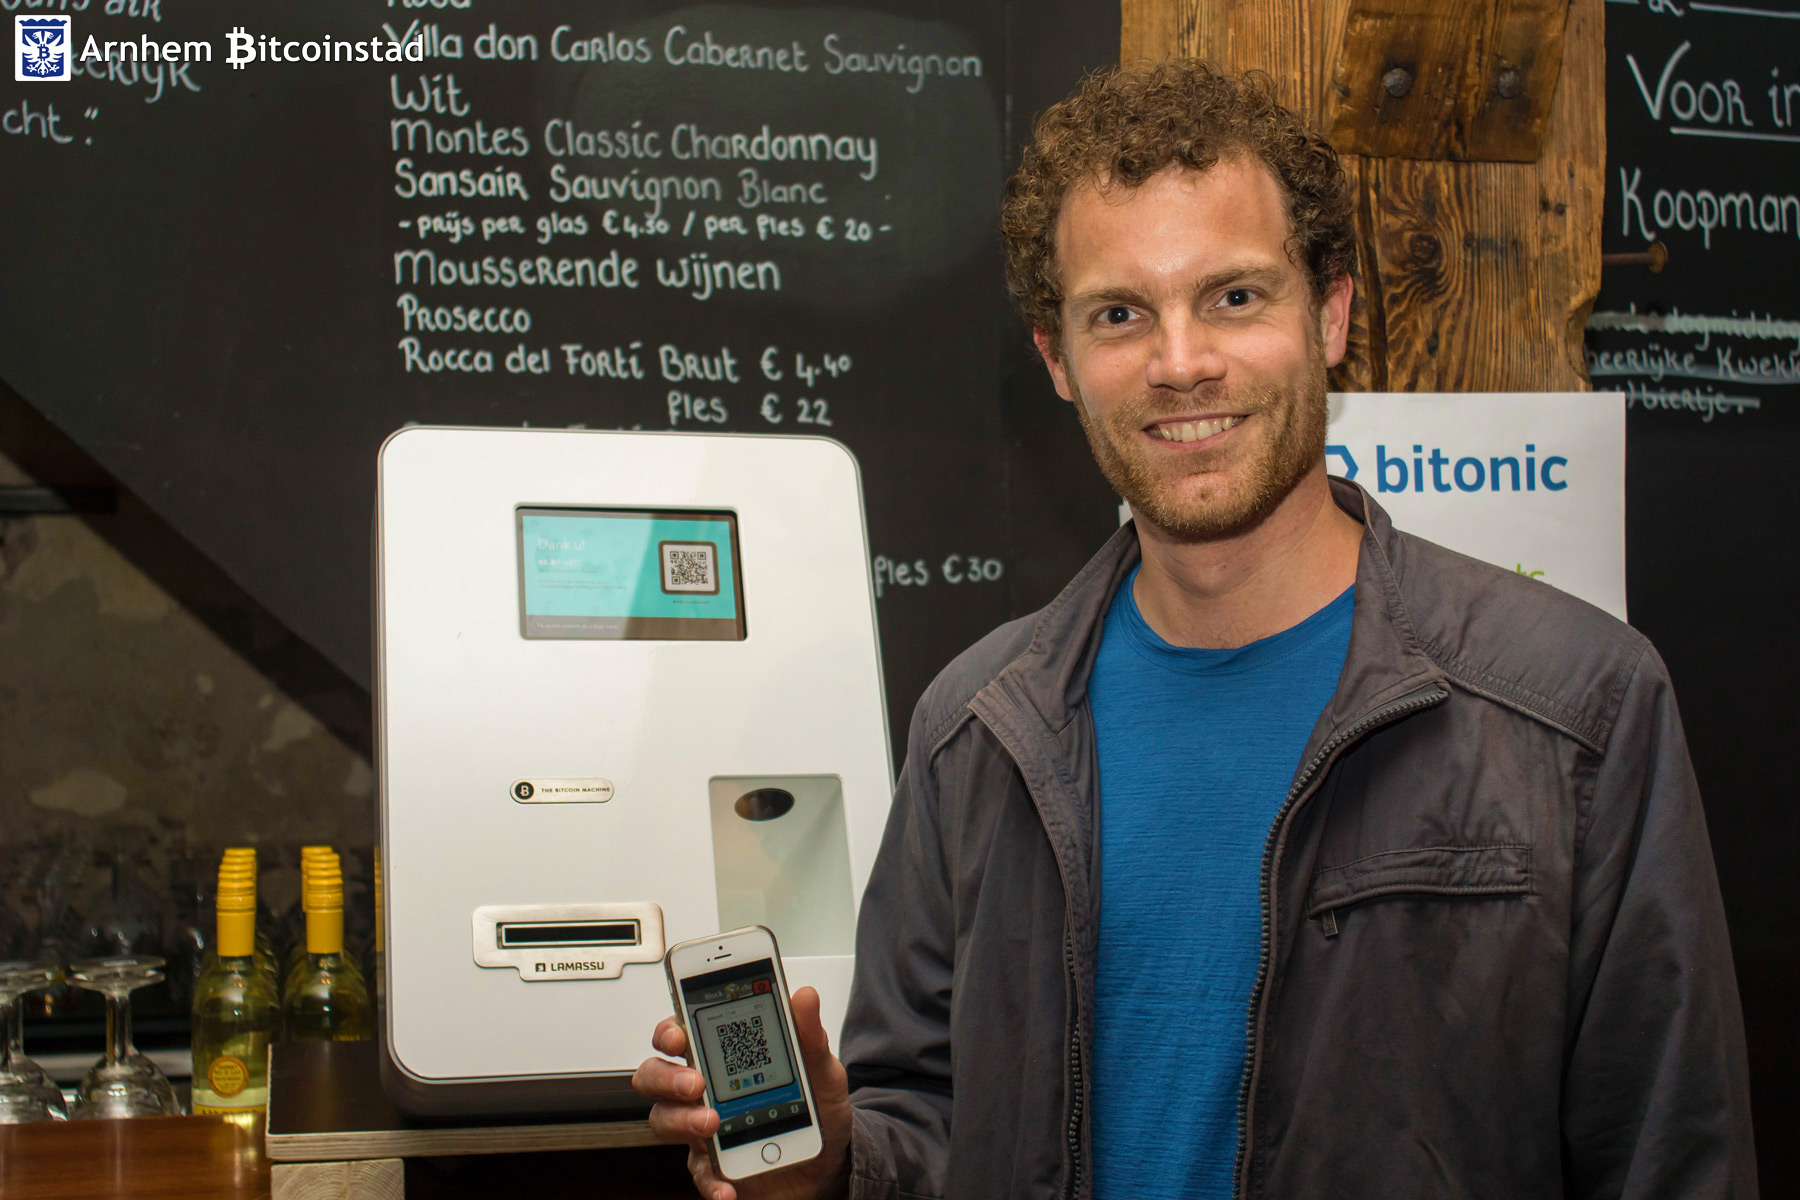 Arhem Bitcoincity event ATM